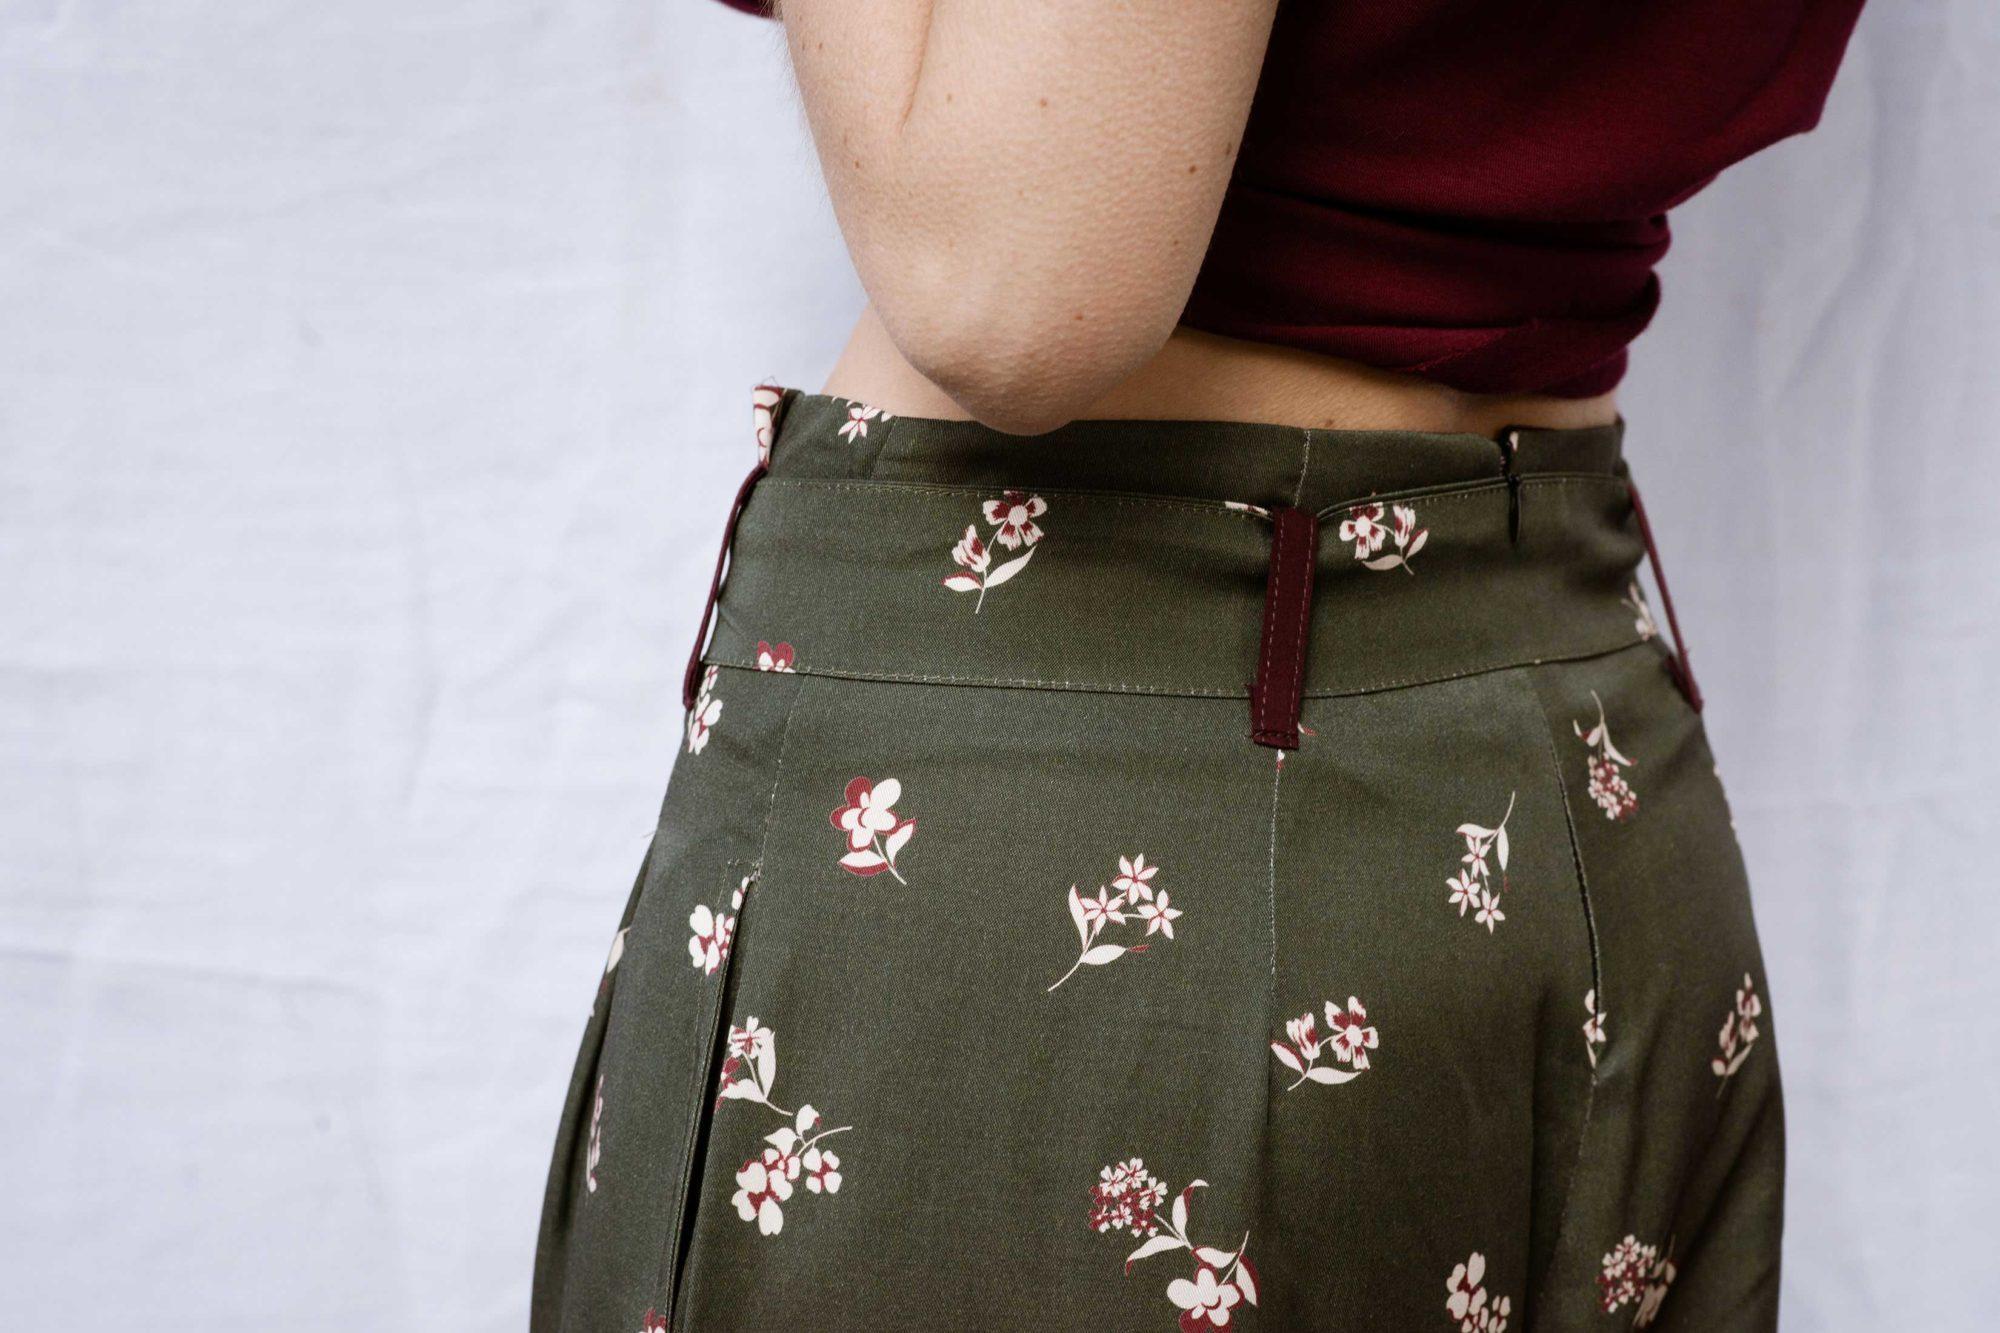 pantalon eva taille haute kaki motif fleur avec ceinture